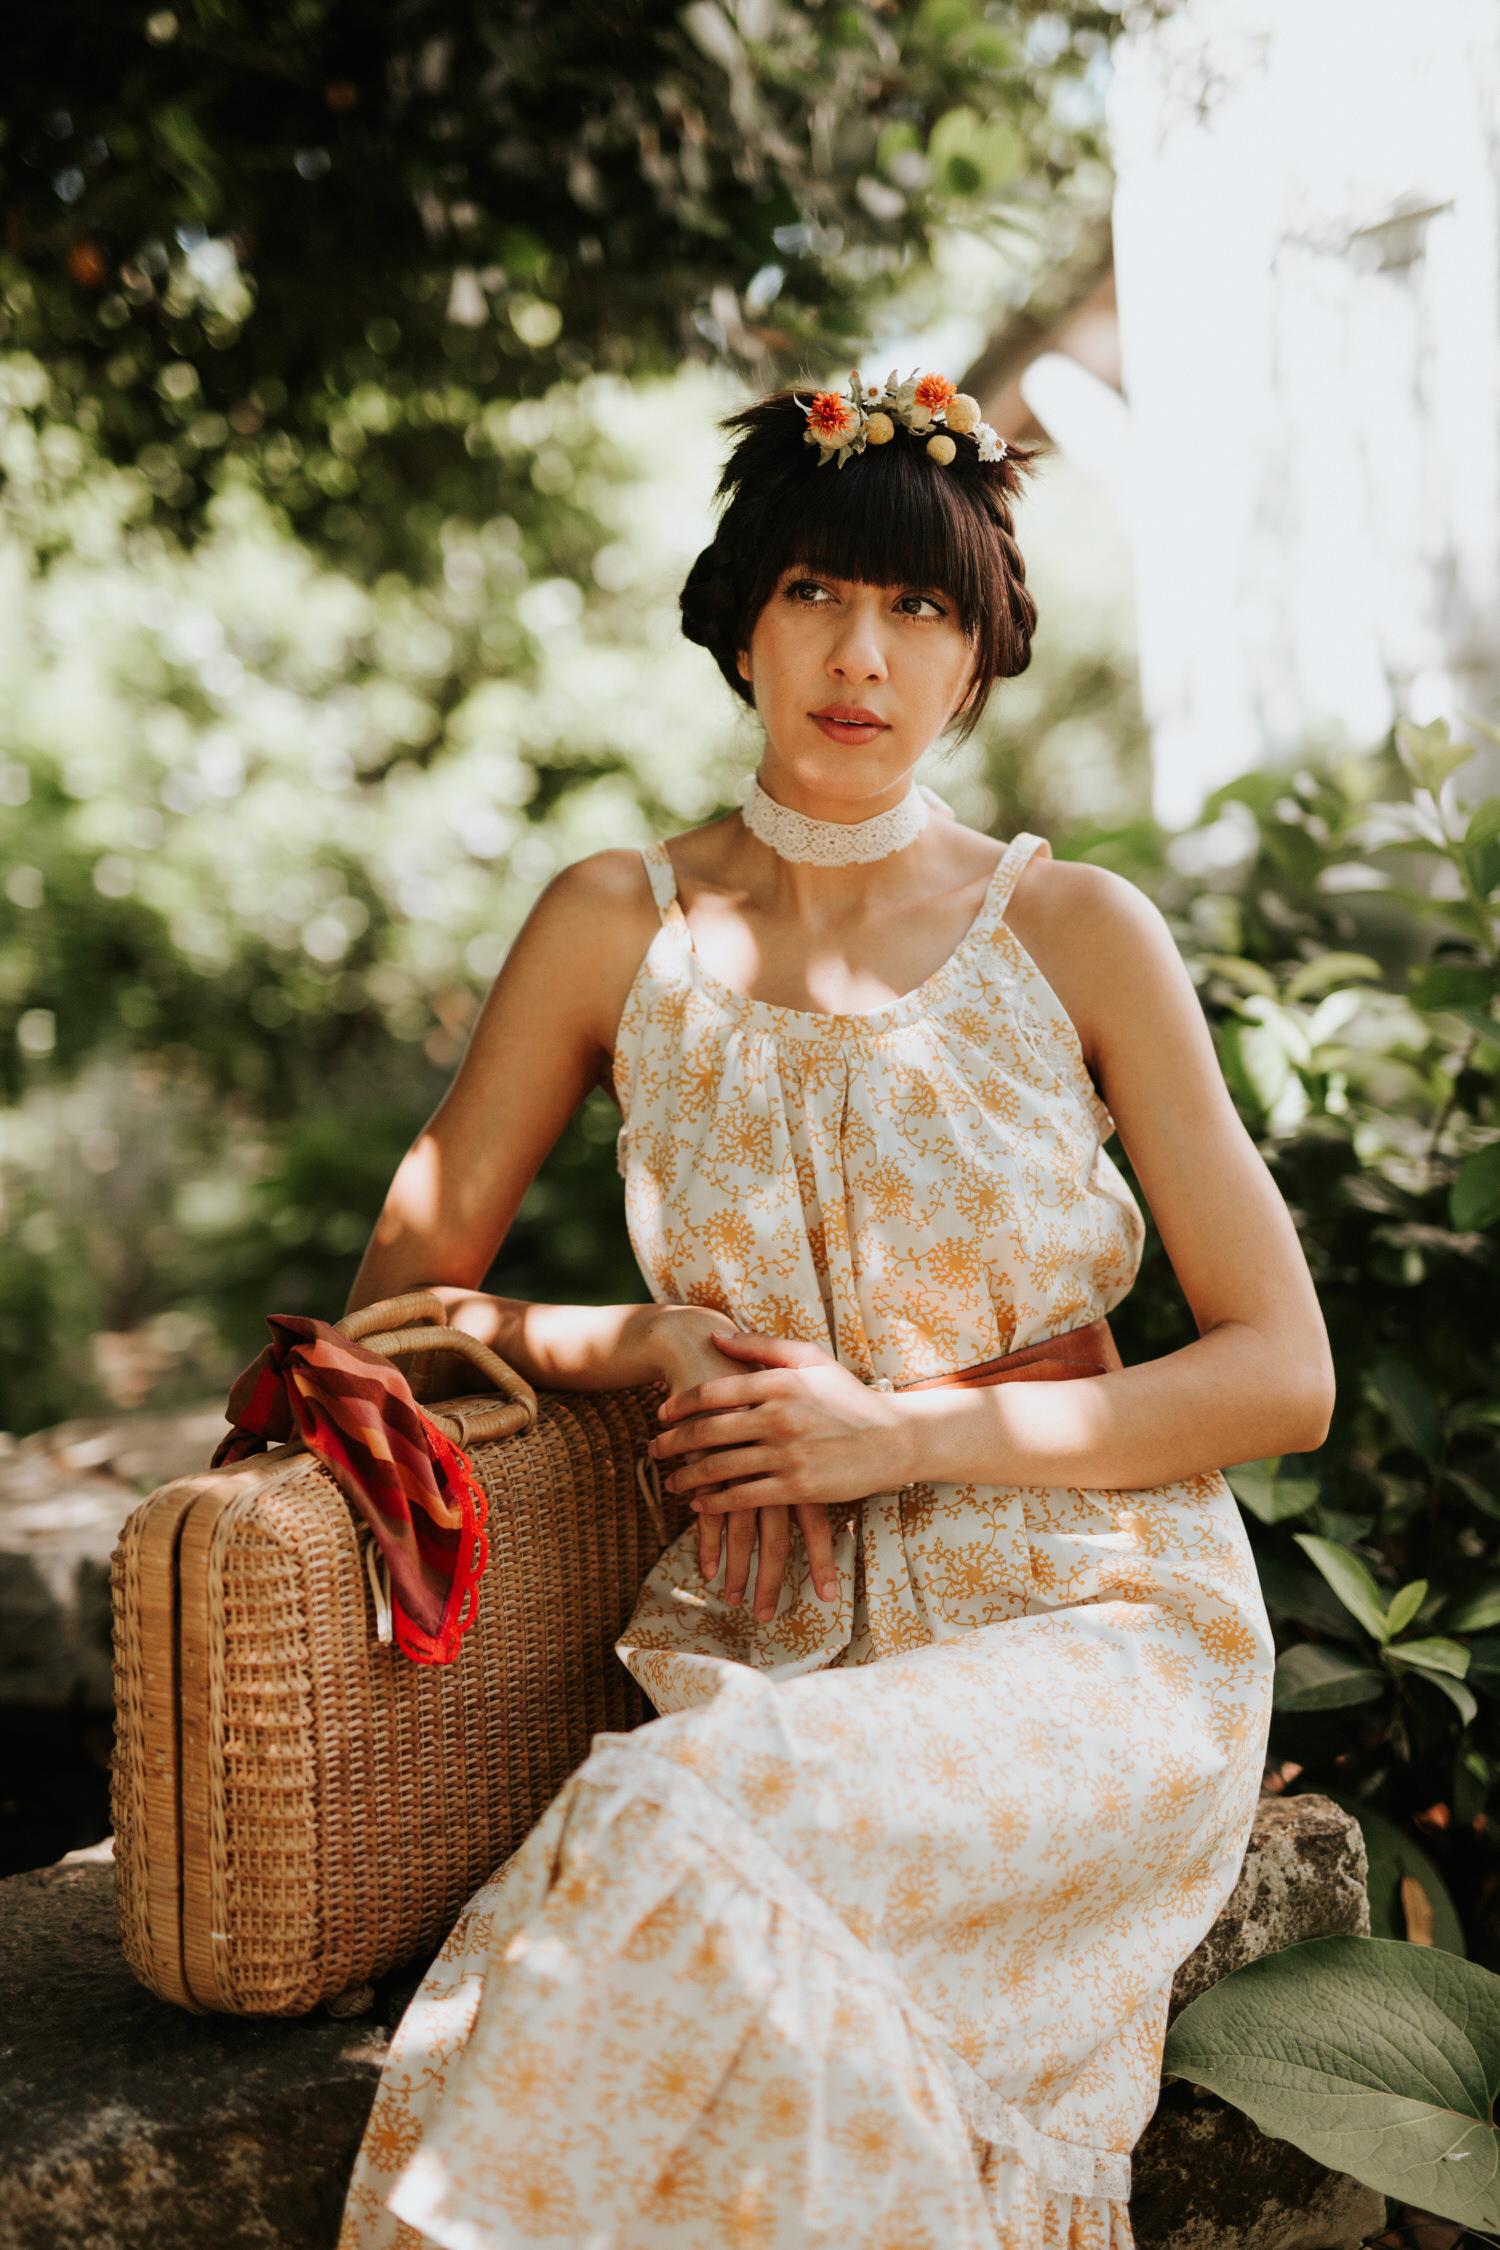 Woman in Rat Des Champs vintage dress with vintage basket case